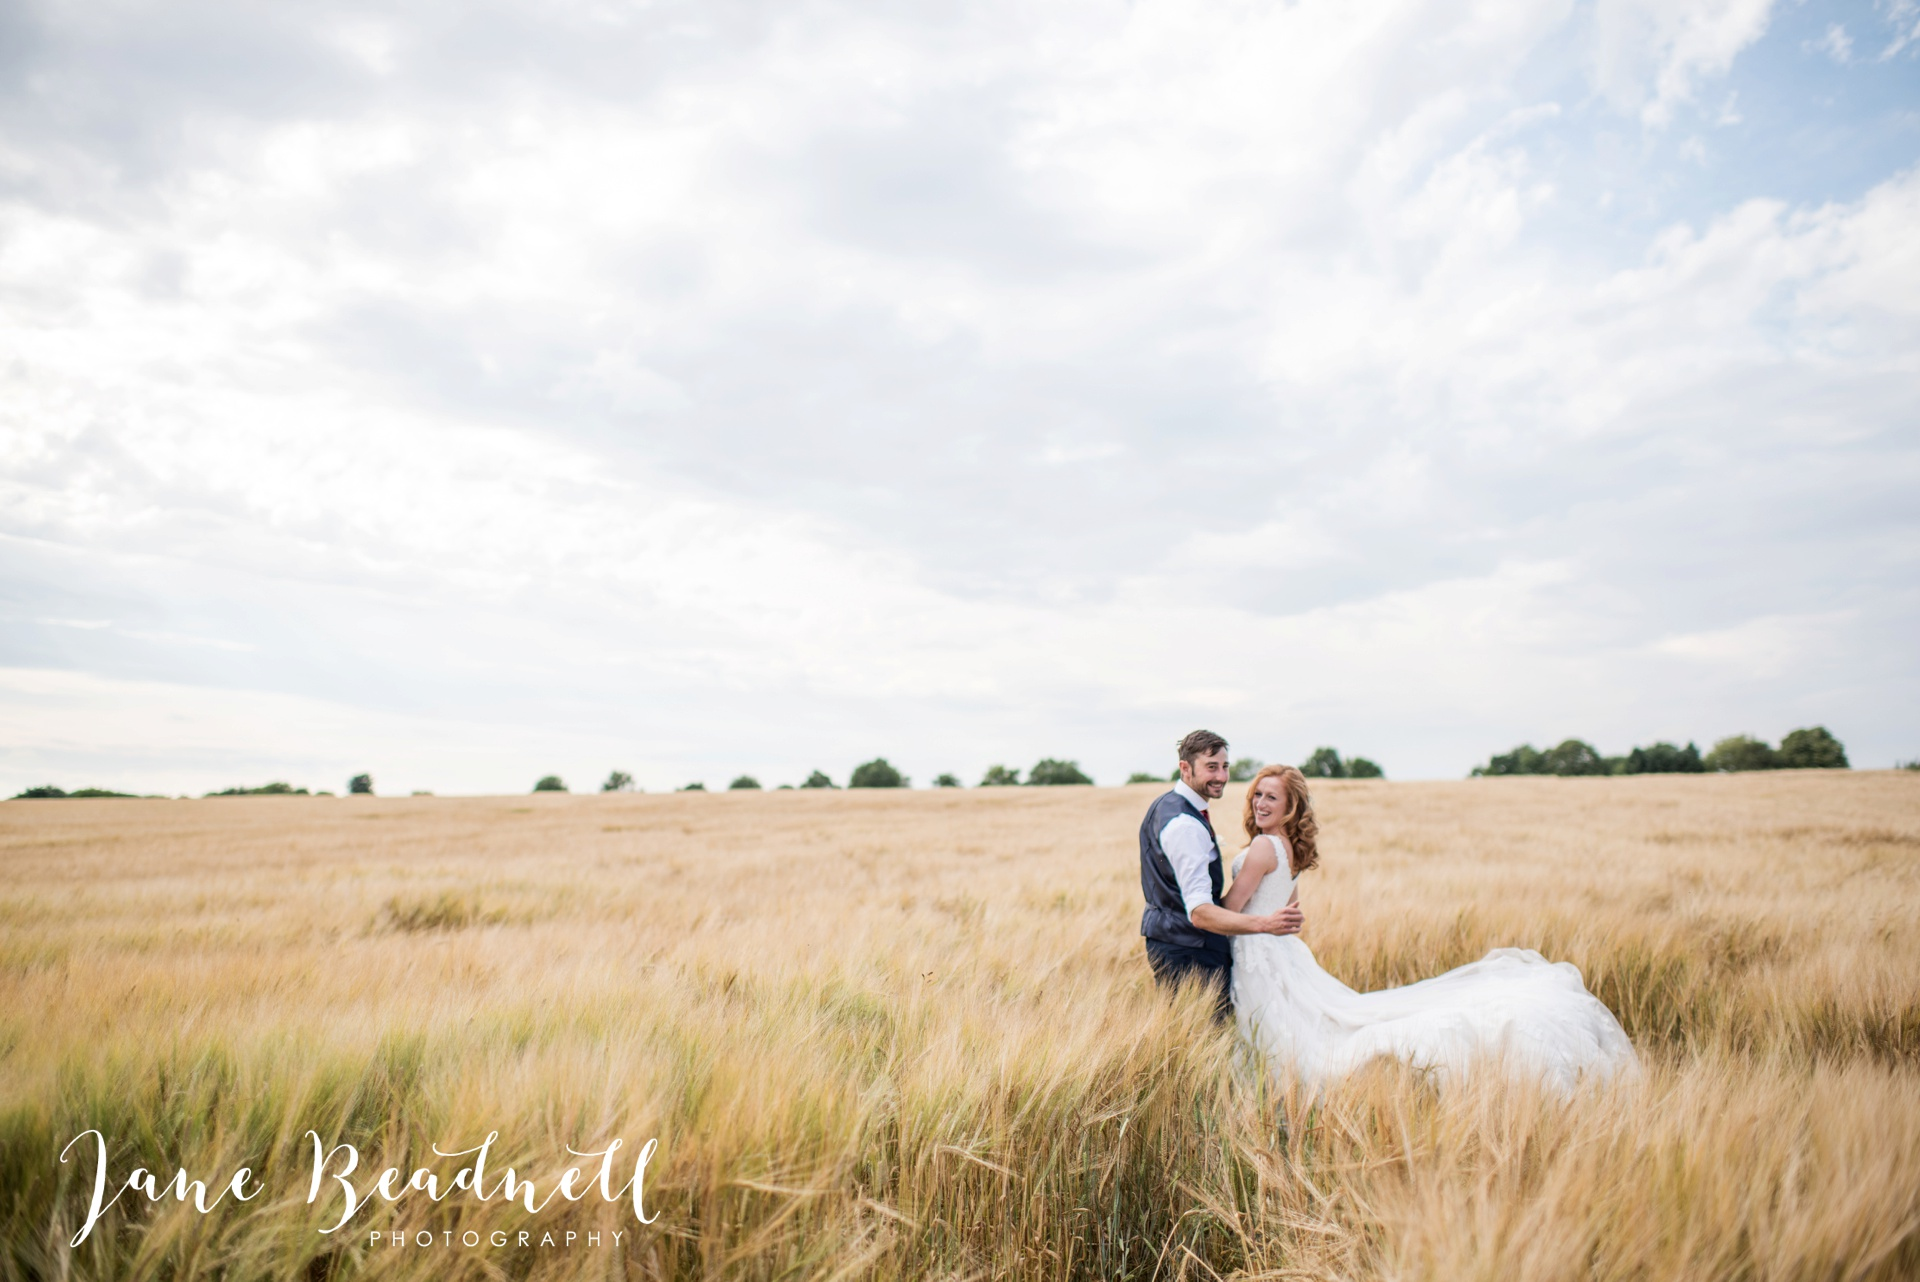 yorkshire-fine-art-wedding-photographer-jane-beadnell-photography-poppleton-york_0132